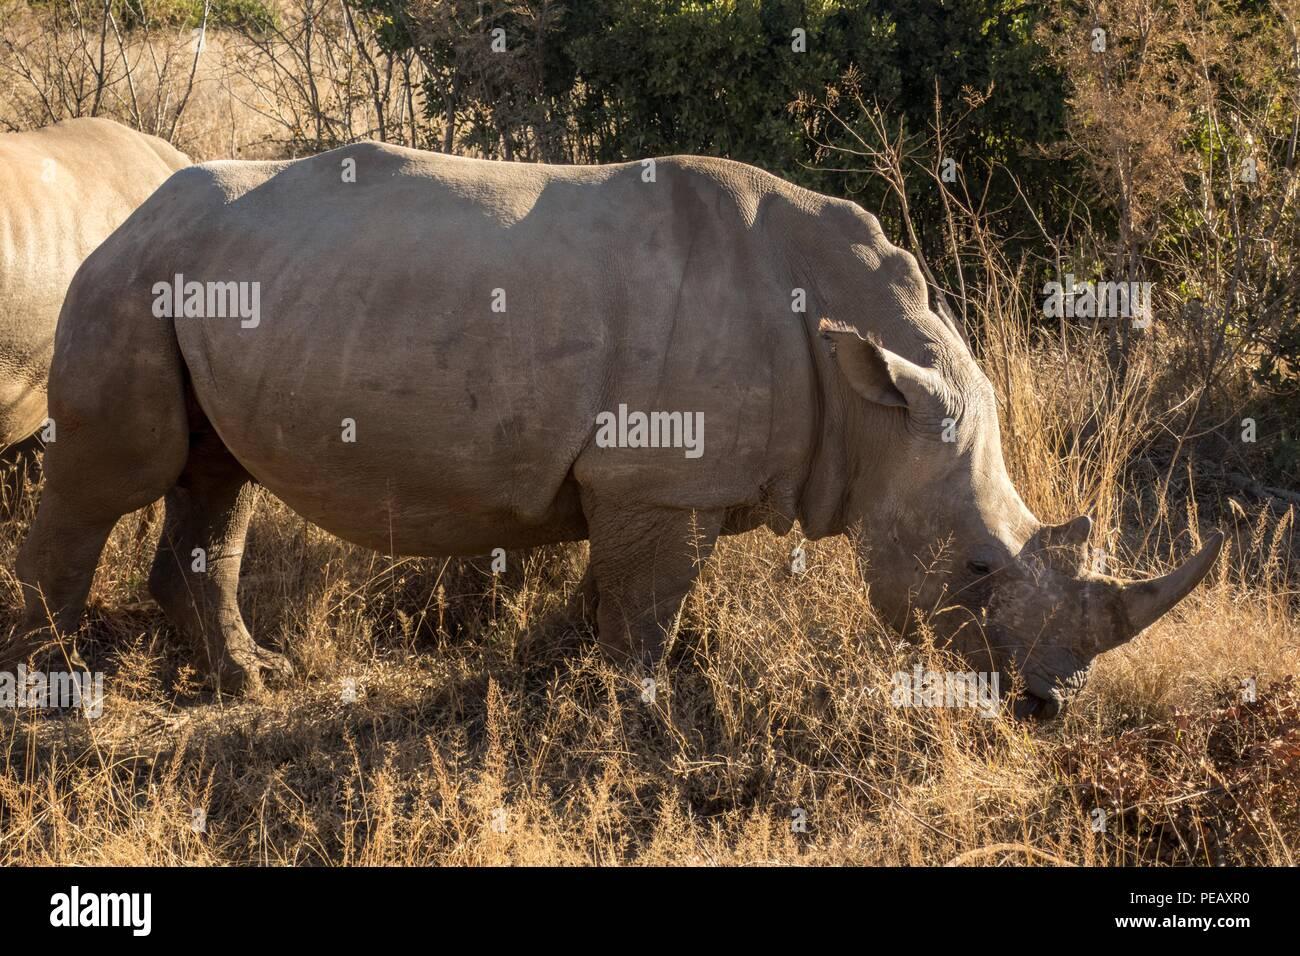 White rhino in Pilanesberg National Park, South Africa - Stock Image